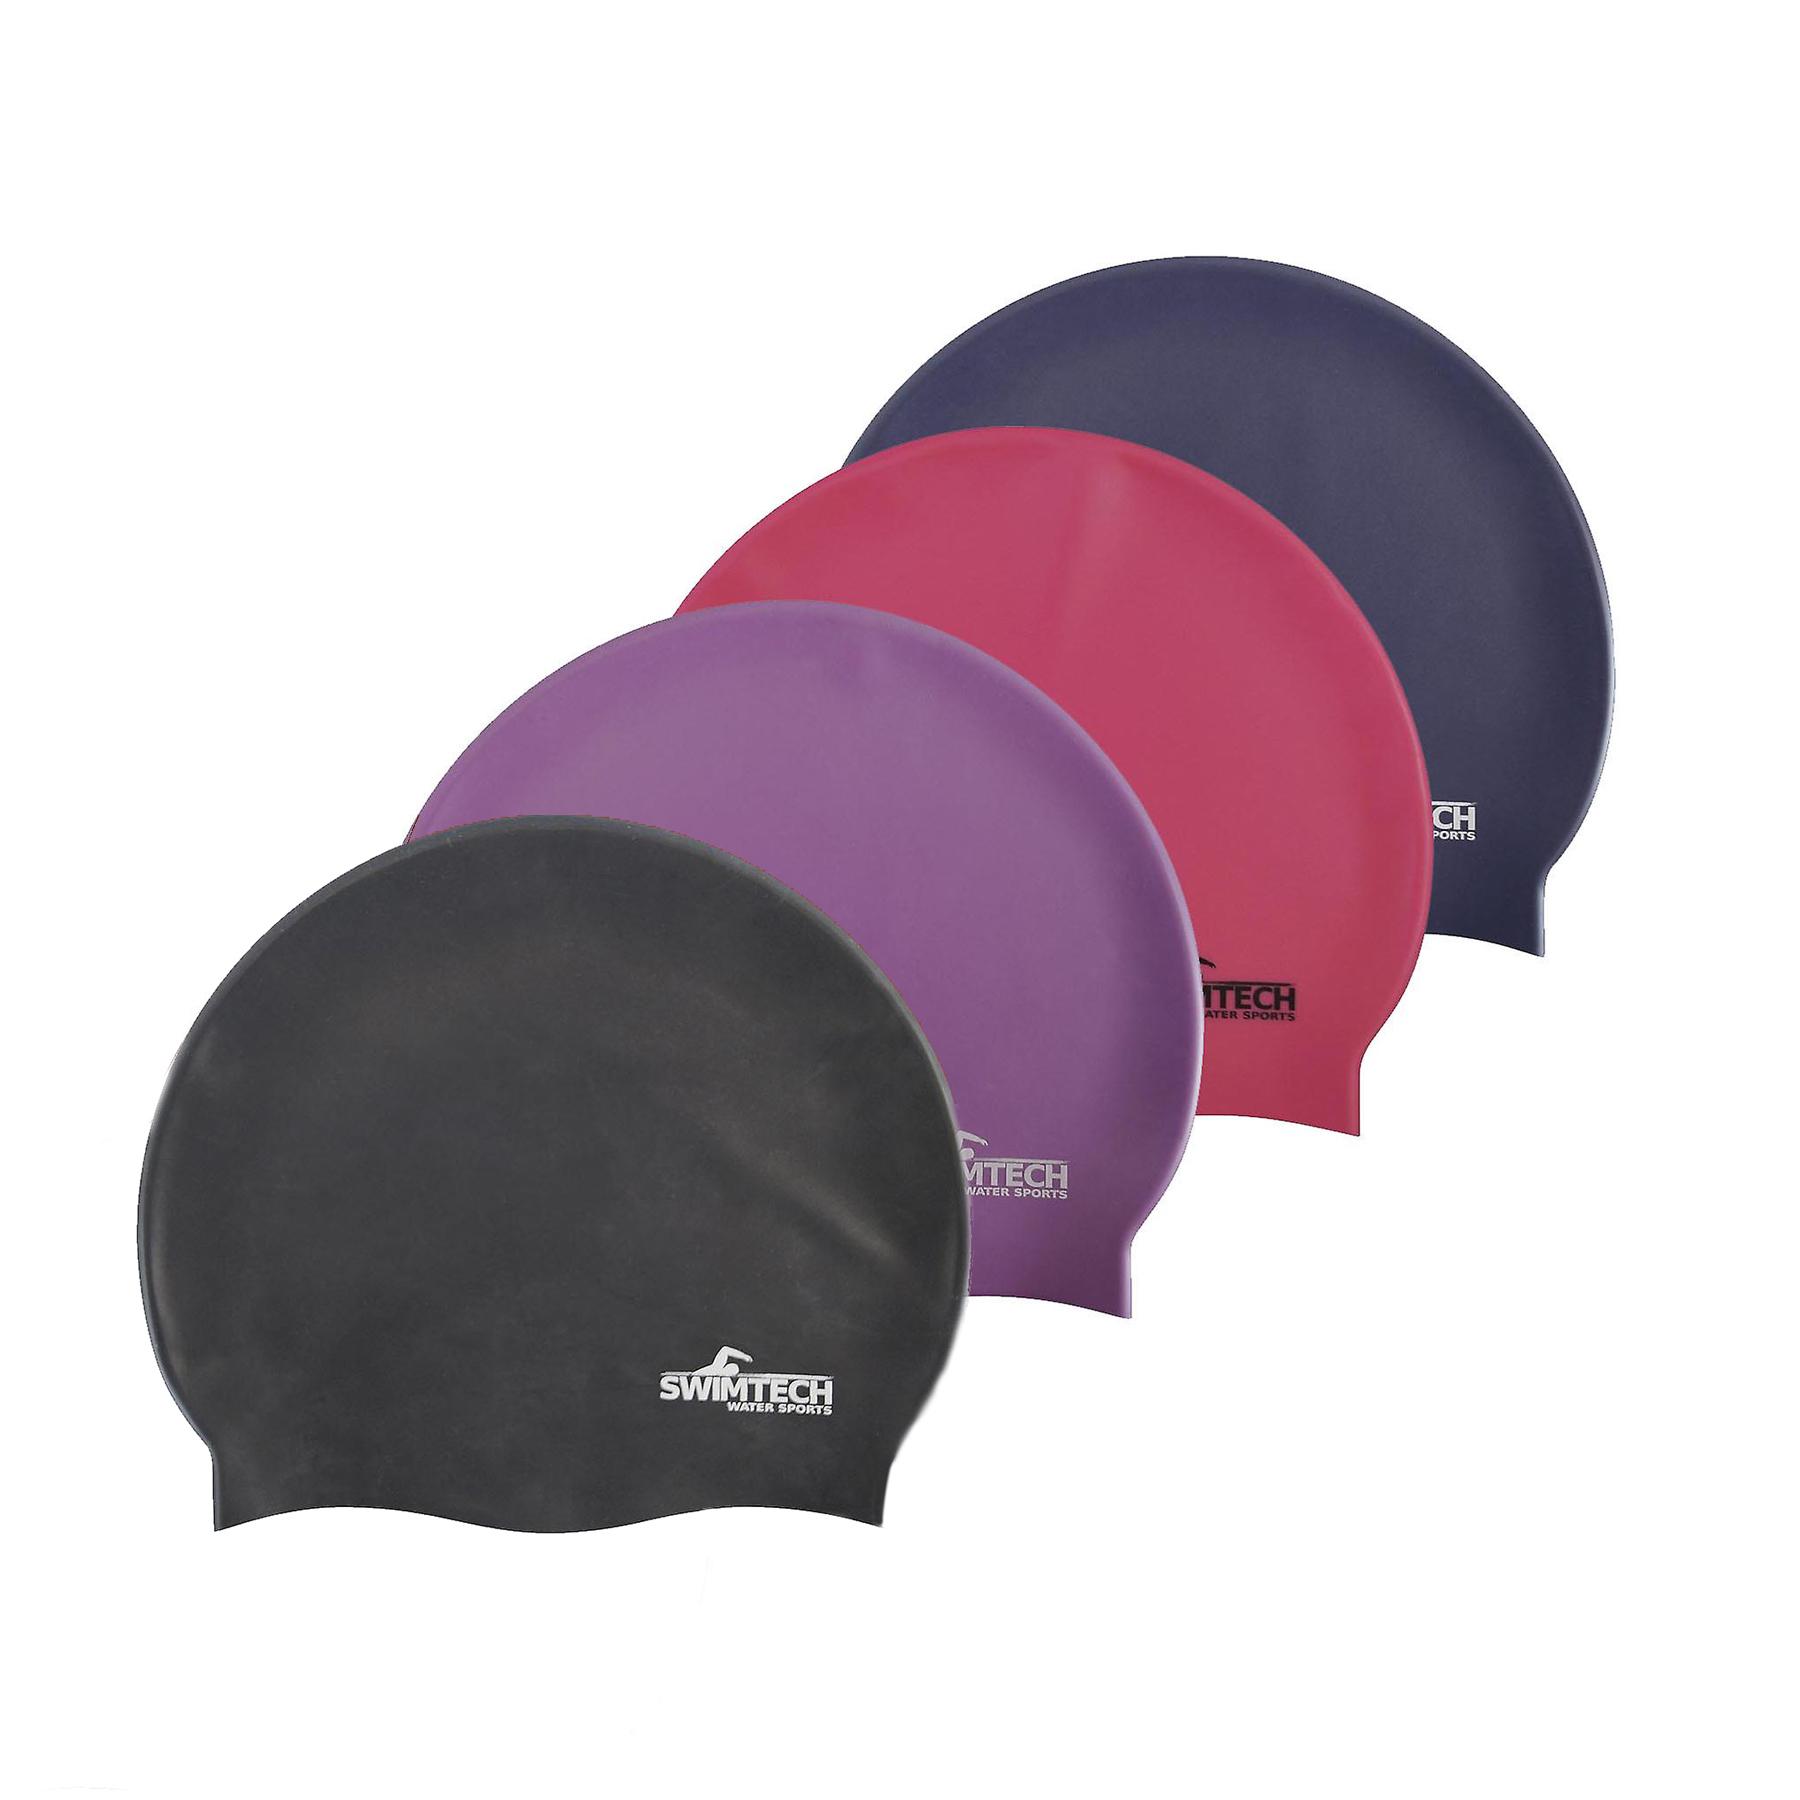 SwimTech Water Sports Silicone Swim Cap • One Size • Black